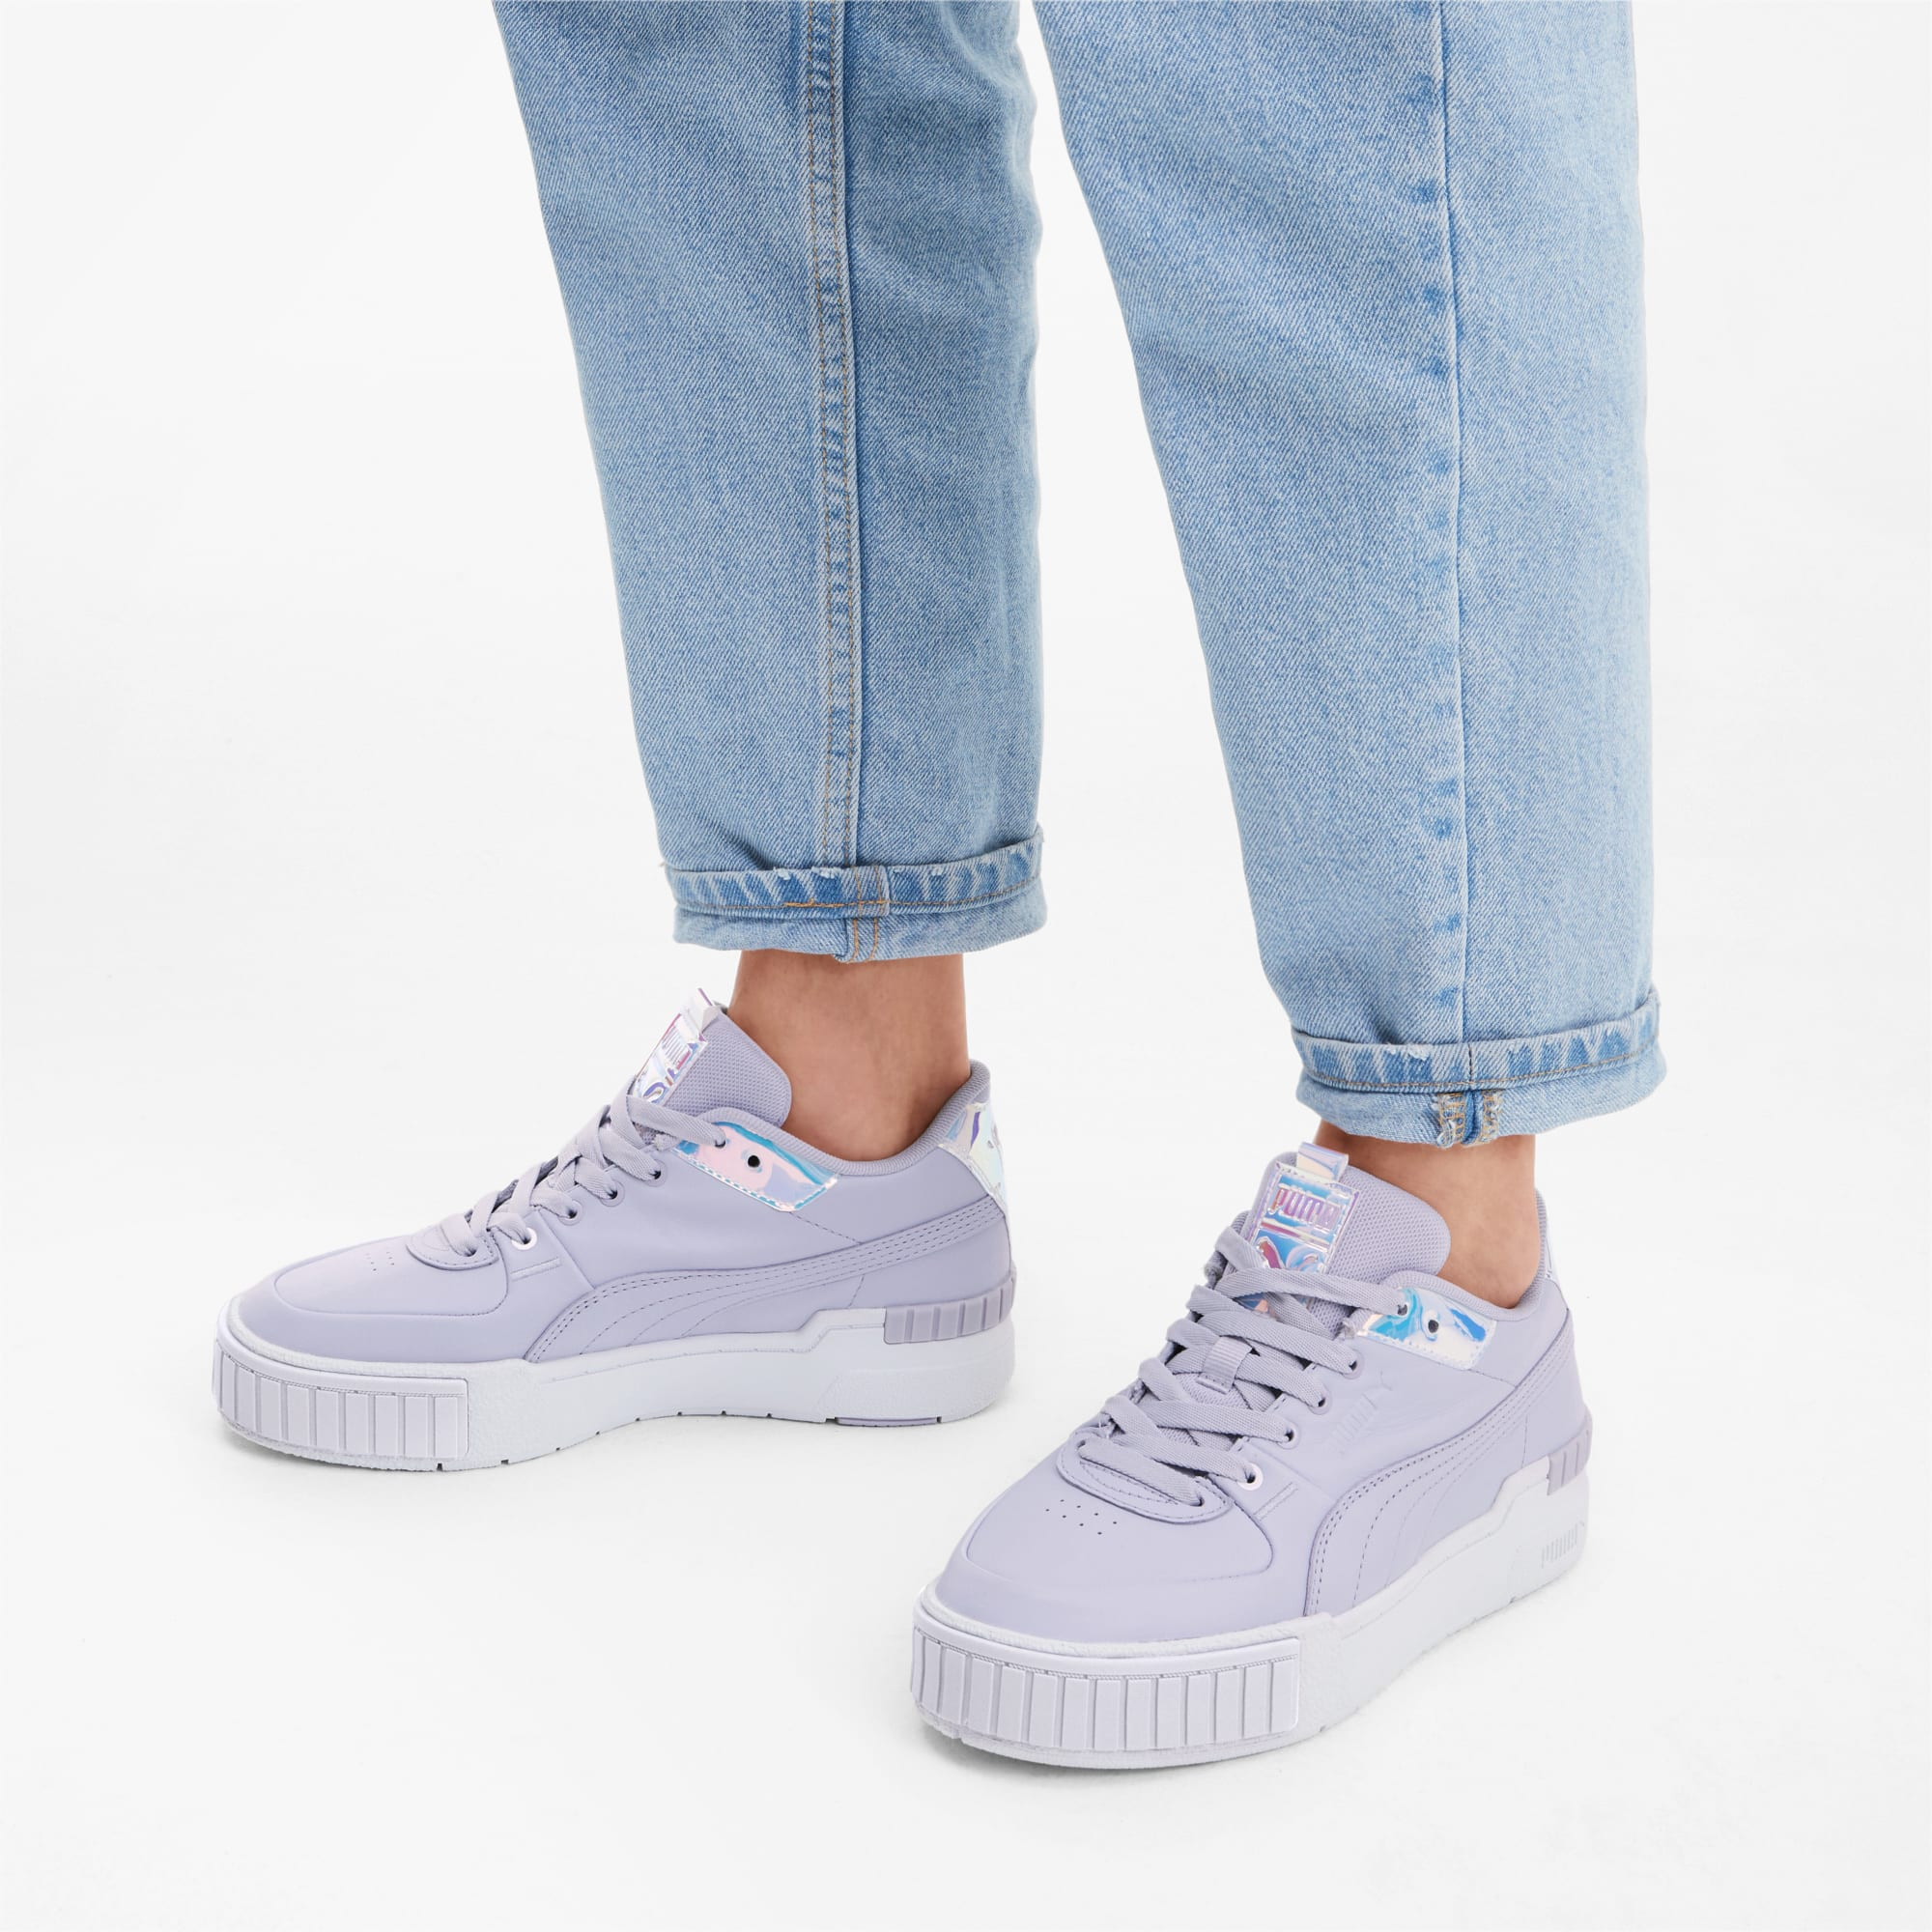 Zapatos deportivos Cali Sport Glow para mujer